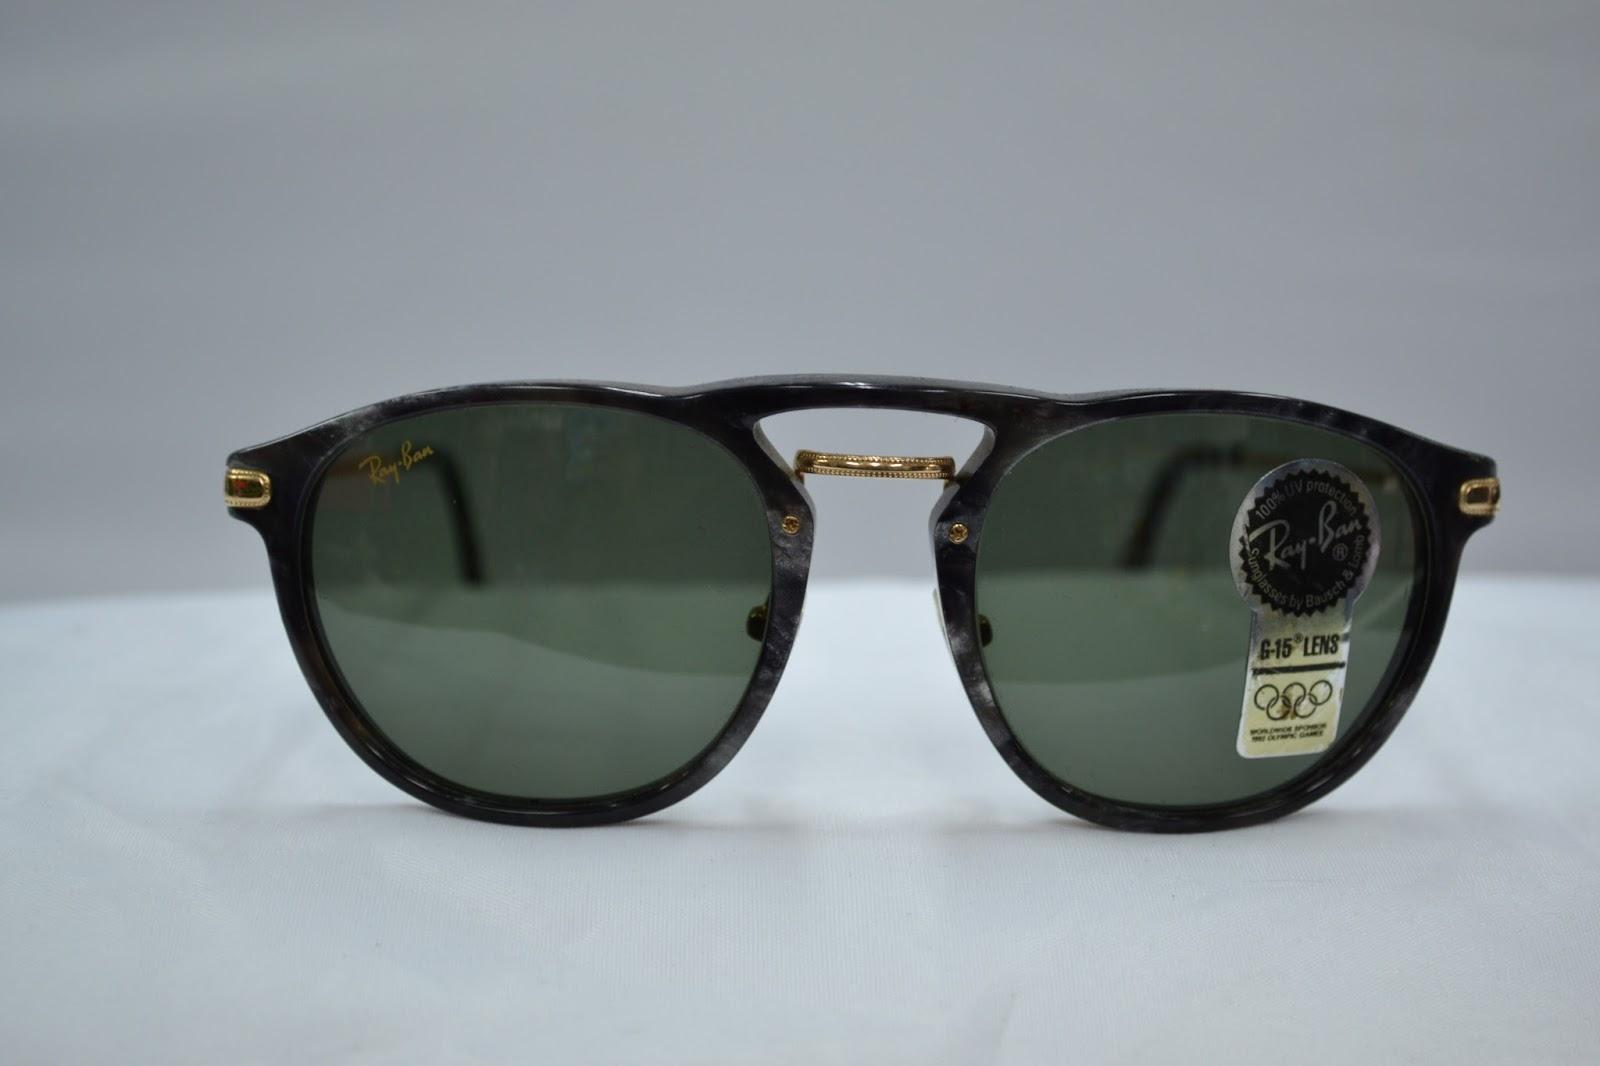 0b6e6b59833 Vintage sunglass  Vintage Ray Ban Premier Combo W1368